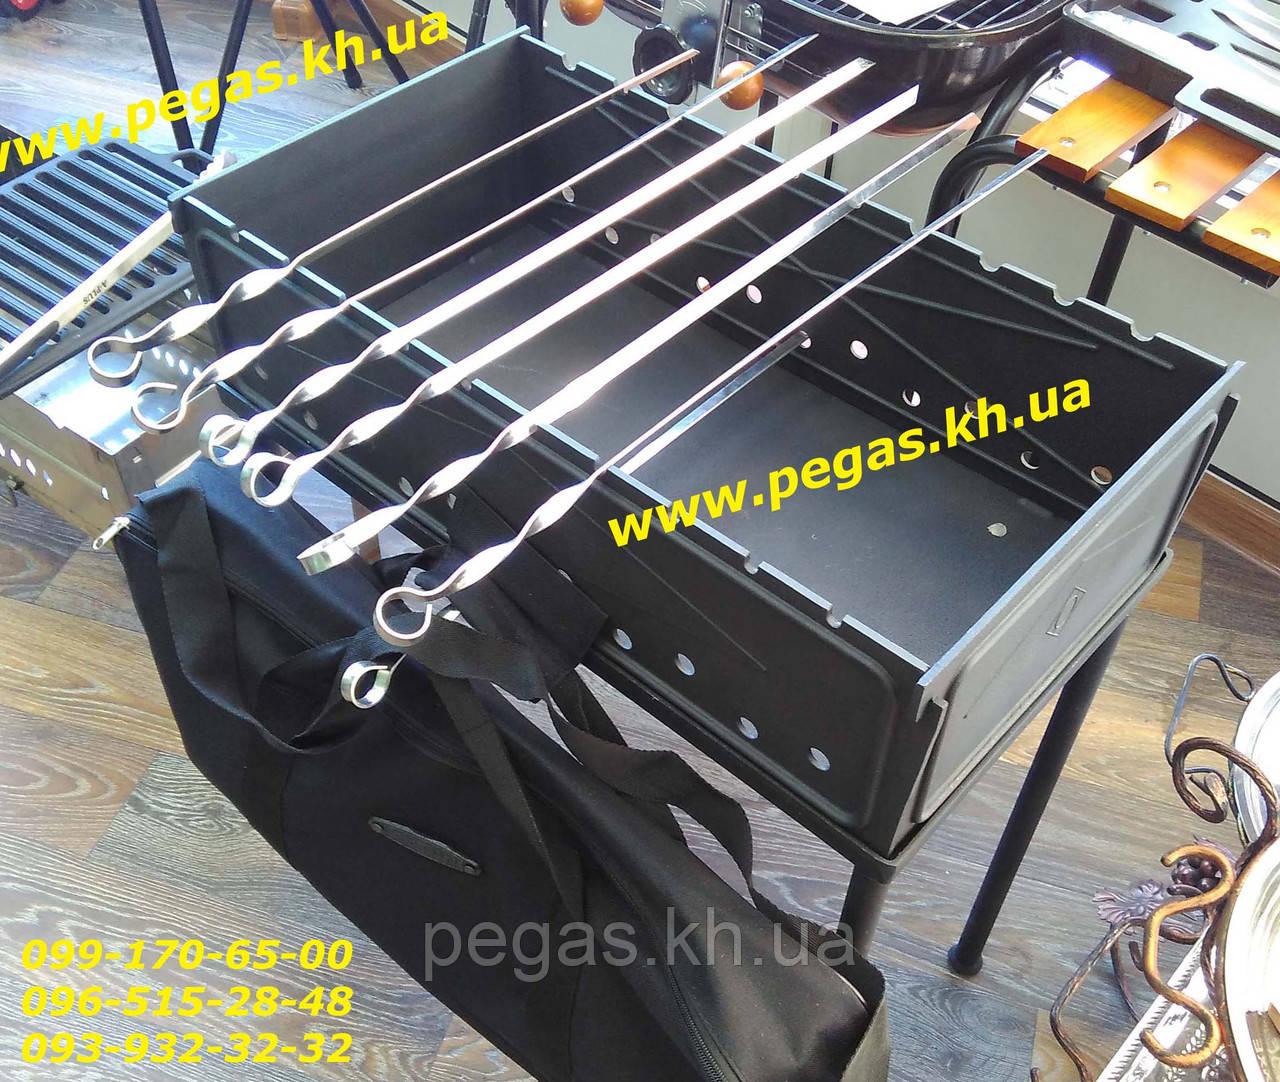 Мангал чугунный разборной с чехлом 55х30х18 см. гриль, барбекю